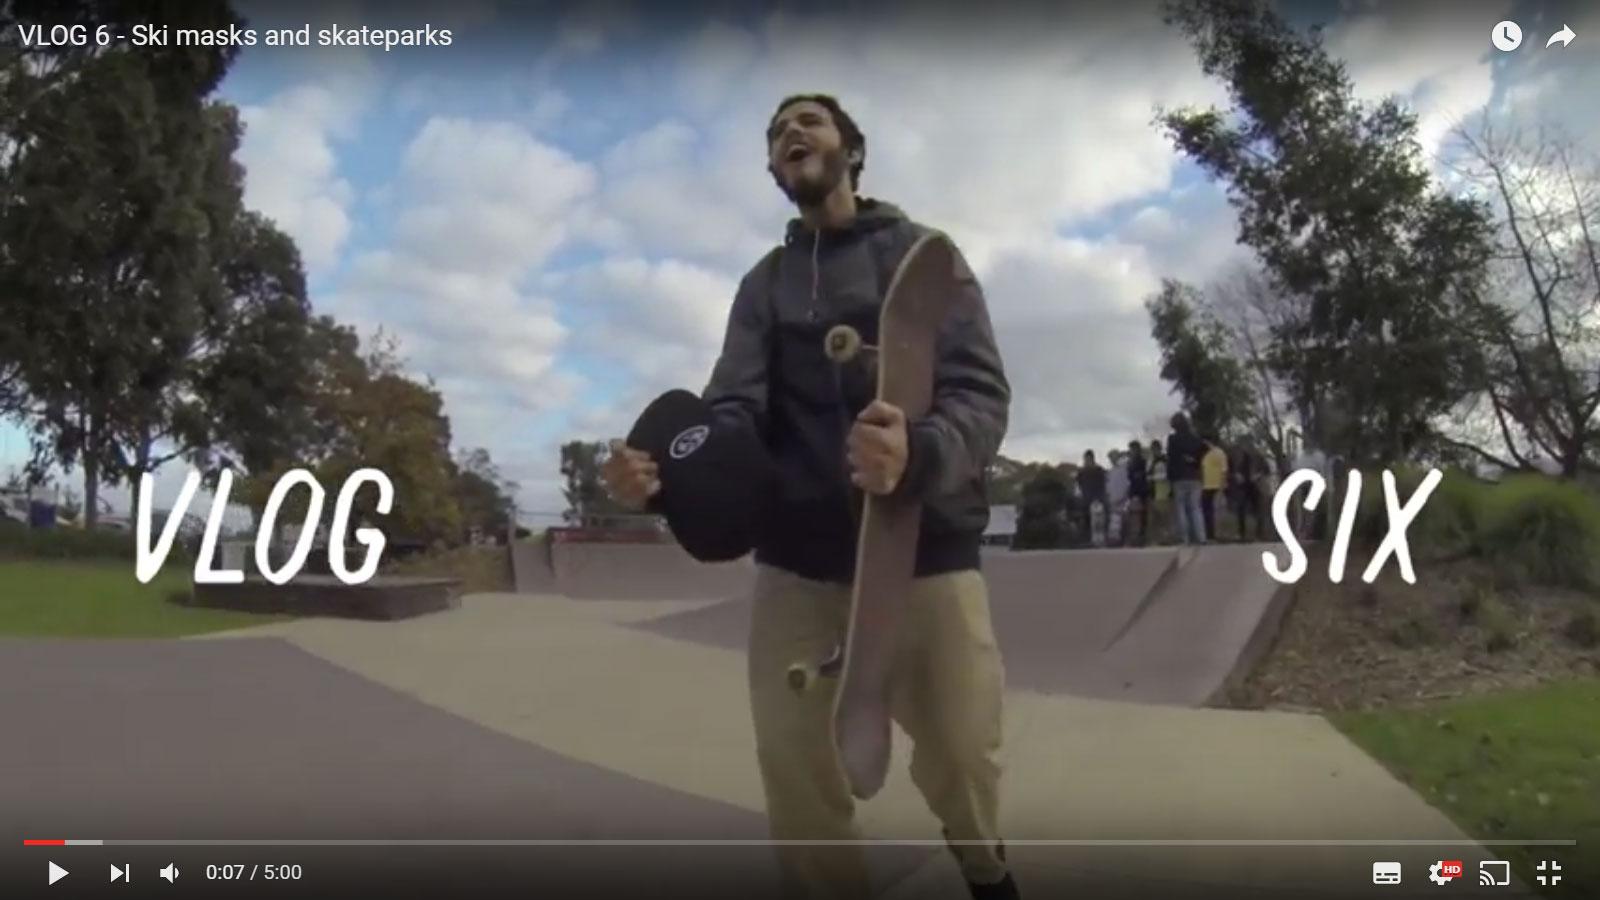 Vlog 6 – Ski masks and skateparks